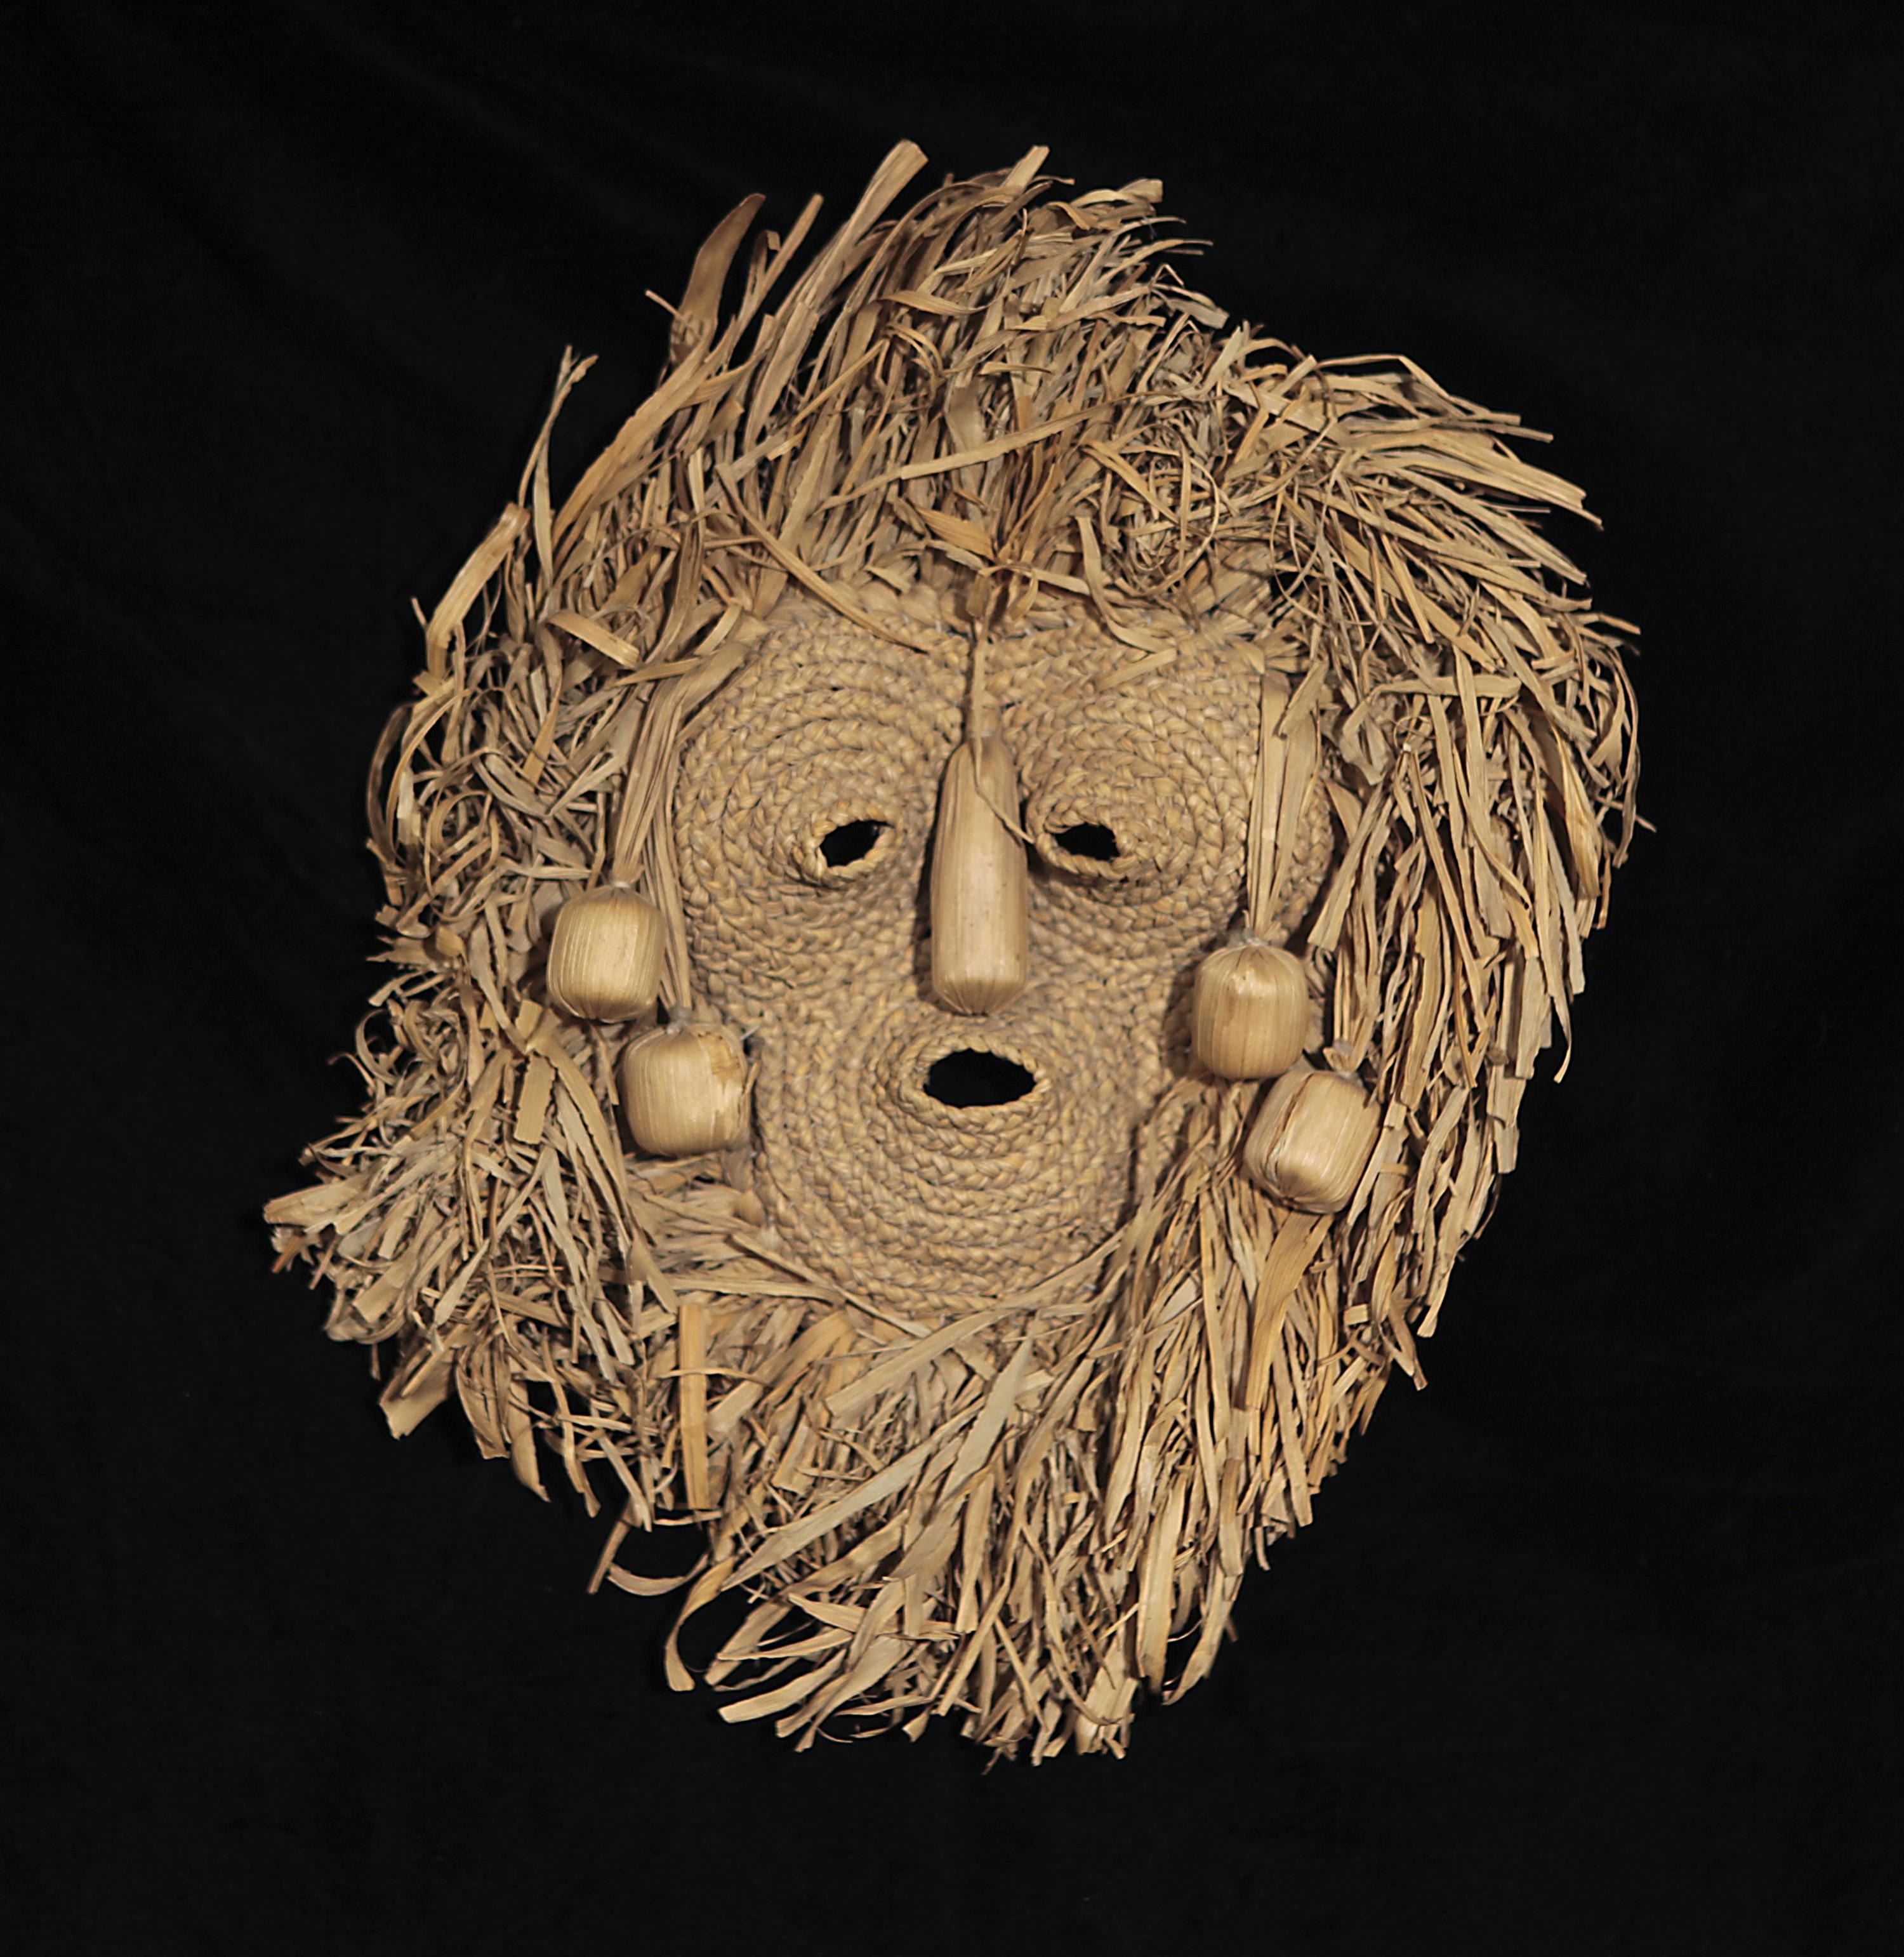 corn-husk-mask.jpg